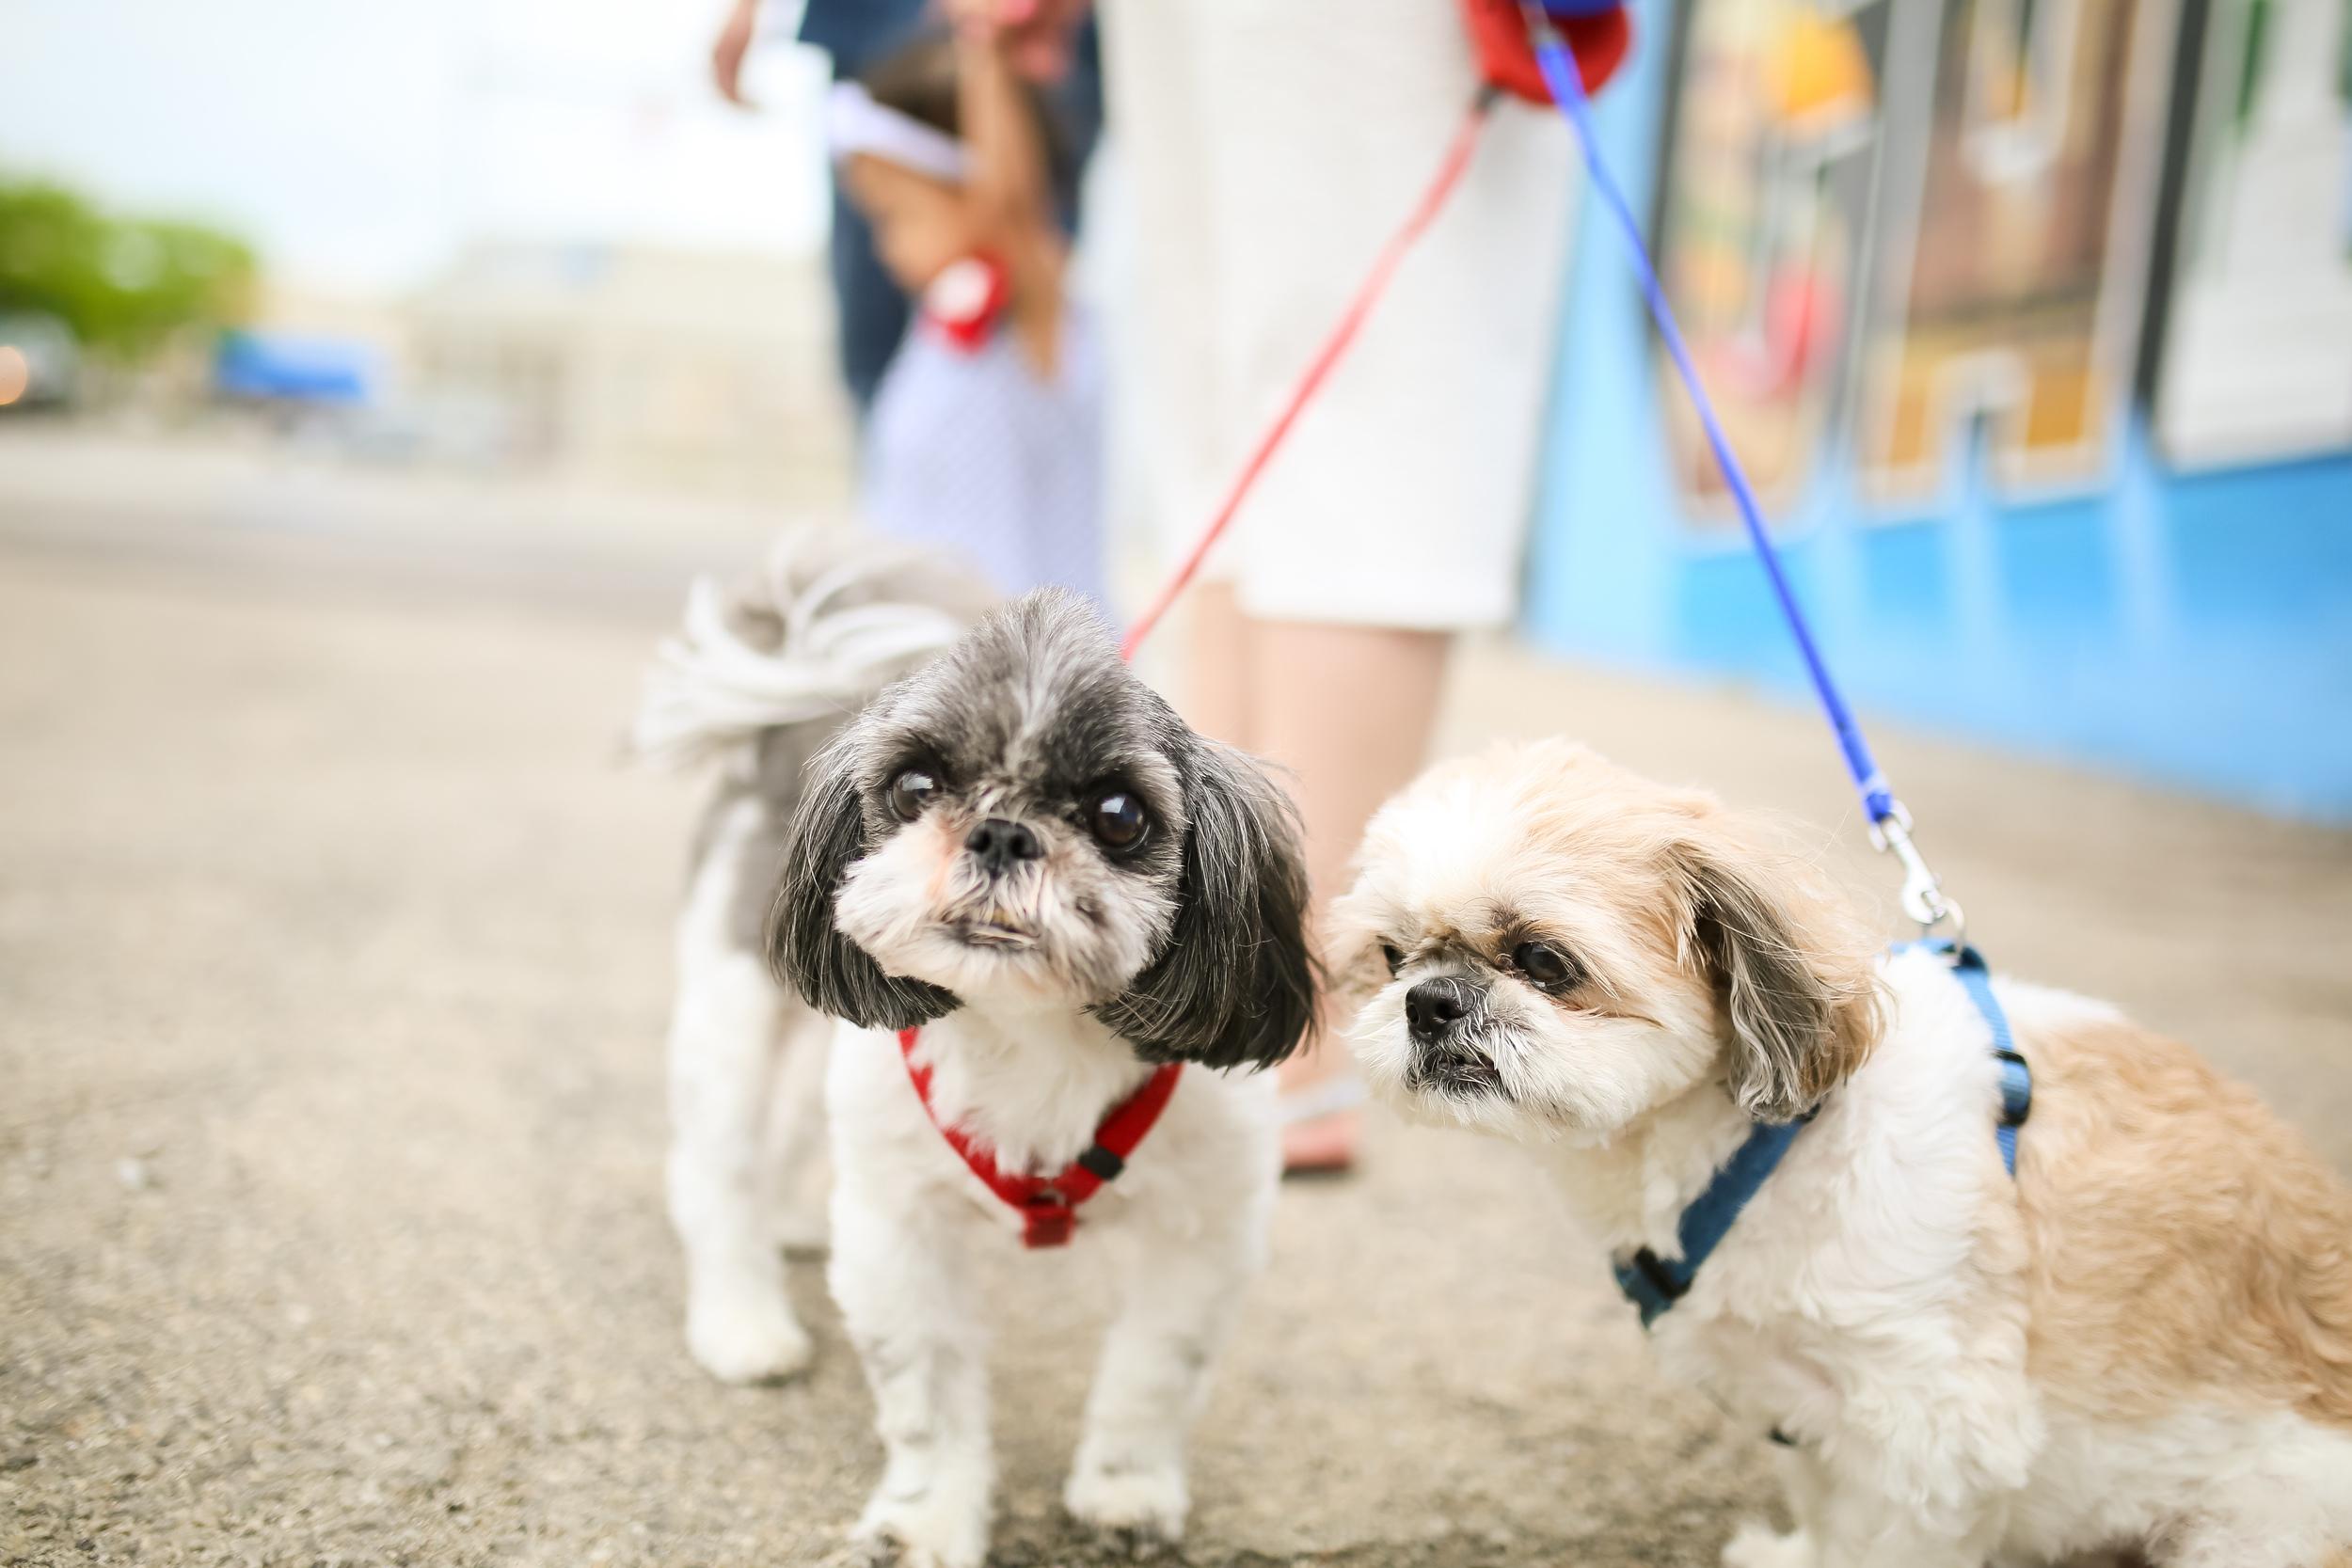 shitzu dogs